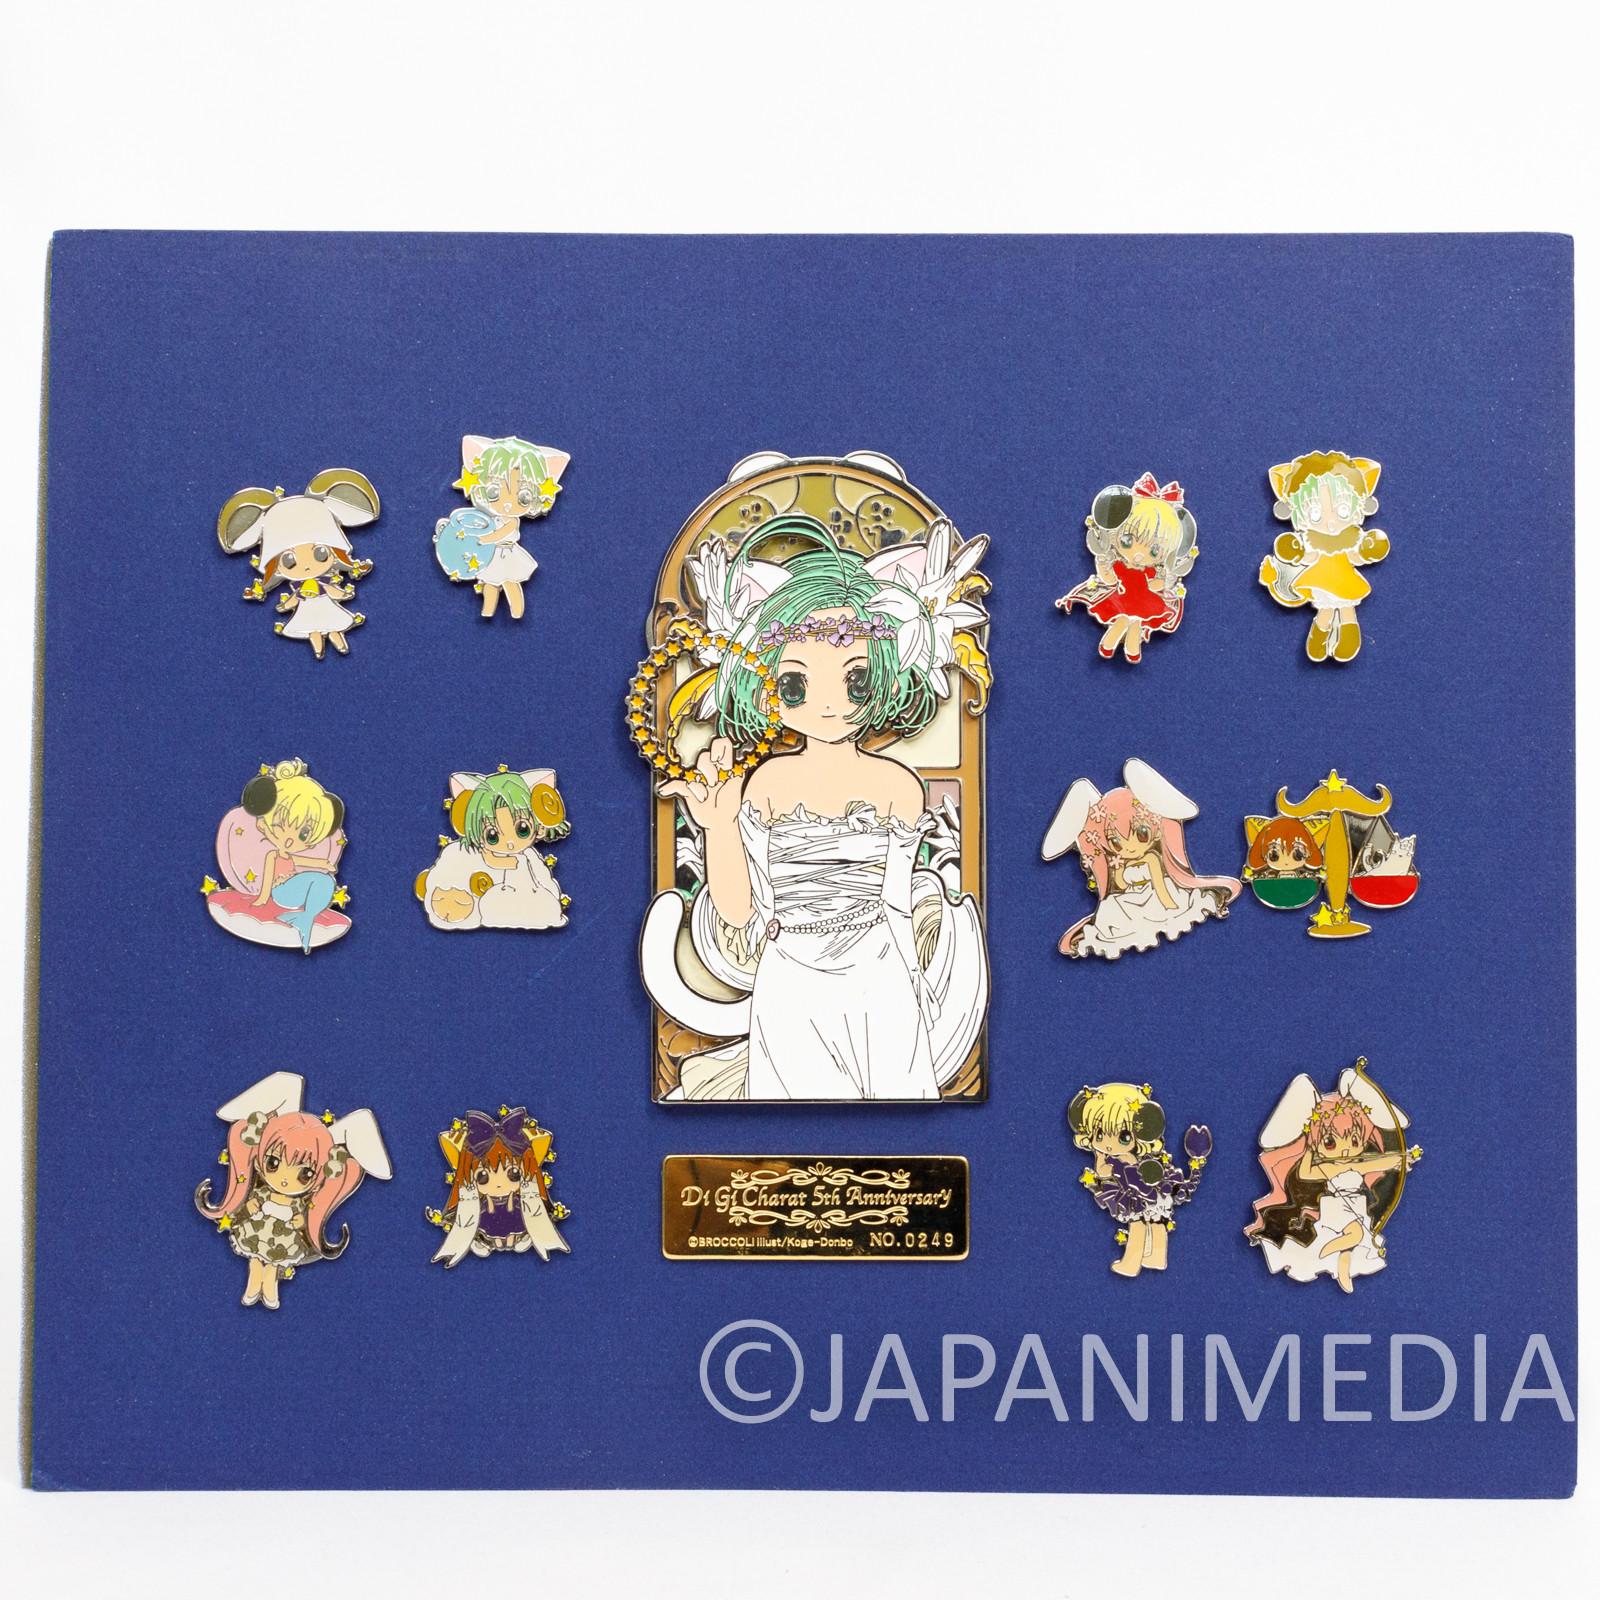 Di Gi Charat Metal Pins Set 5ht Anniversary Limited JAPAN ANIME GAMERS